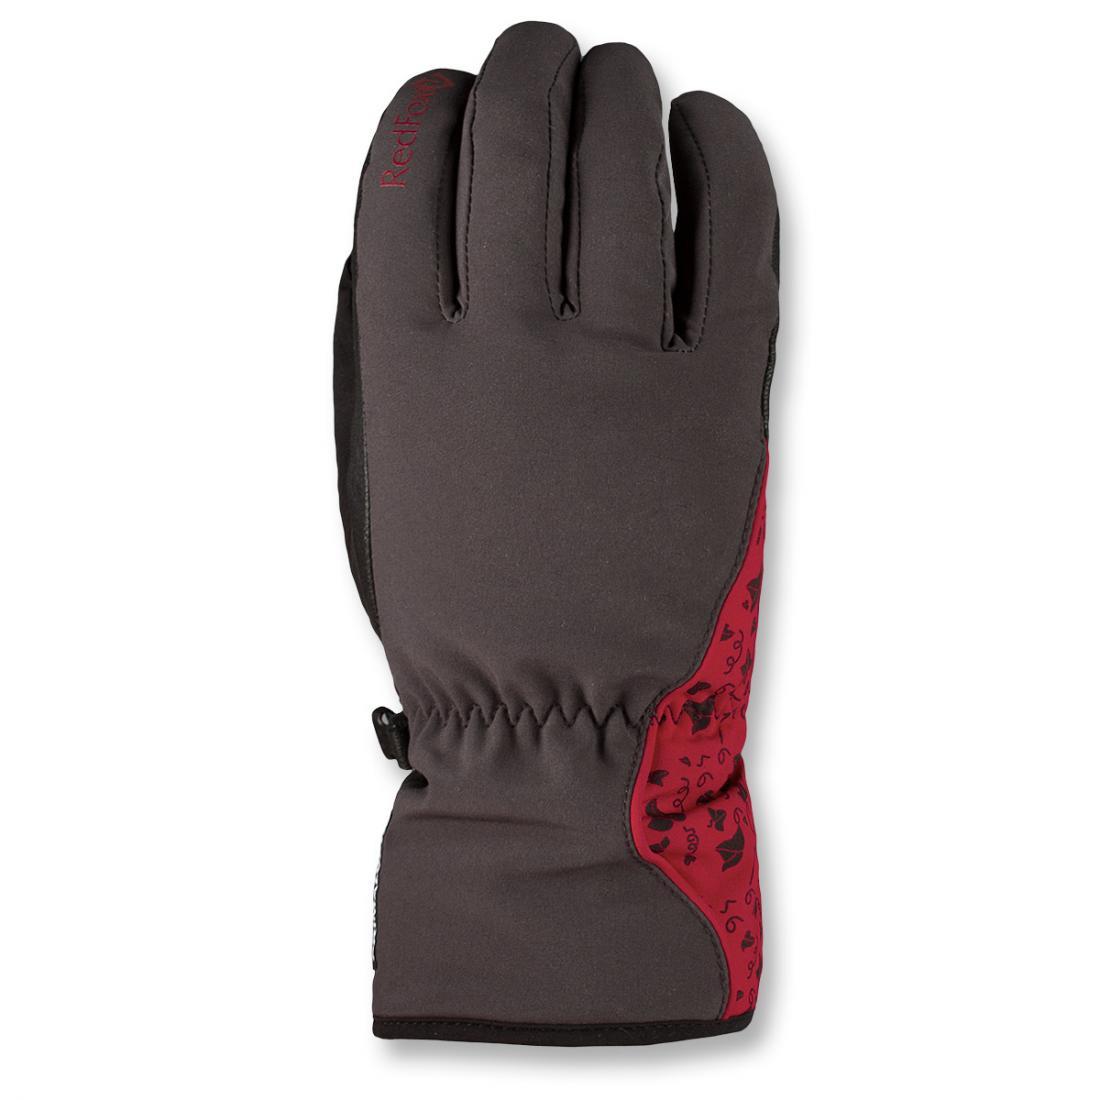 Перчатки женские RozaryПерчатки<br><br><br>Цвет: Красный<br>Размер: S